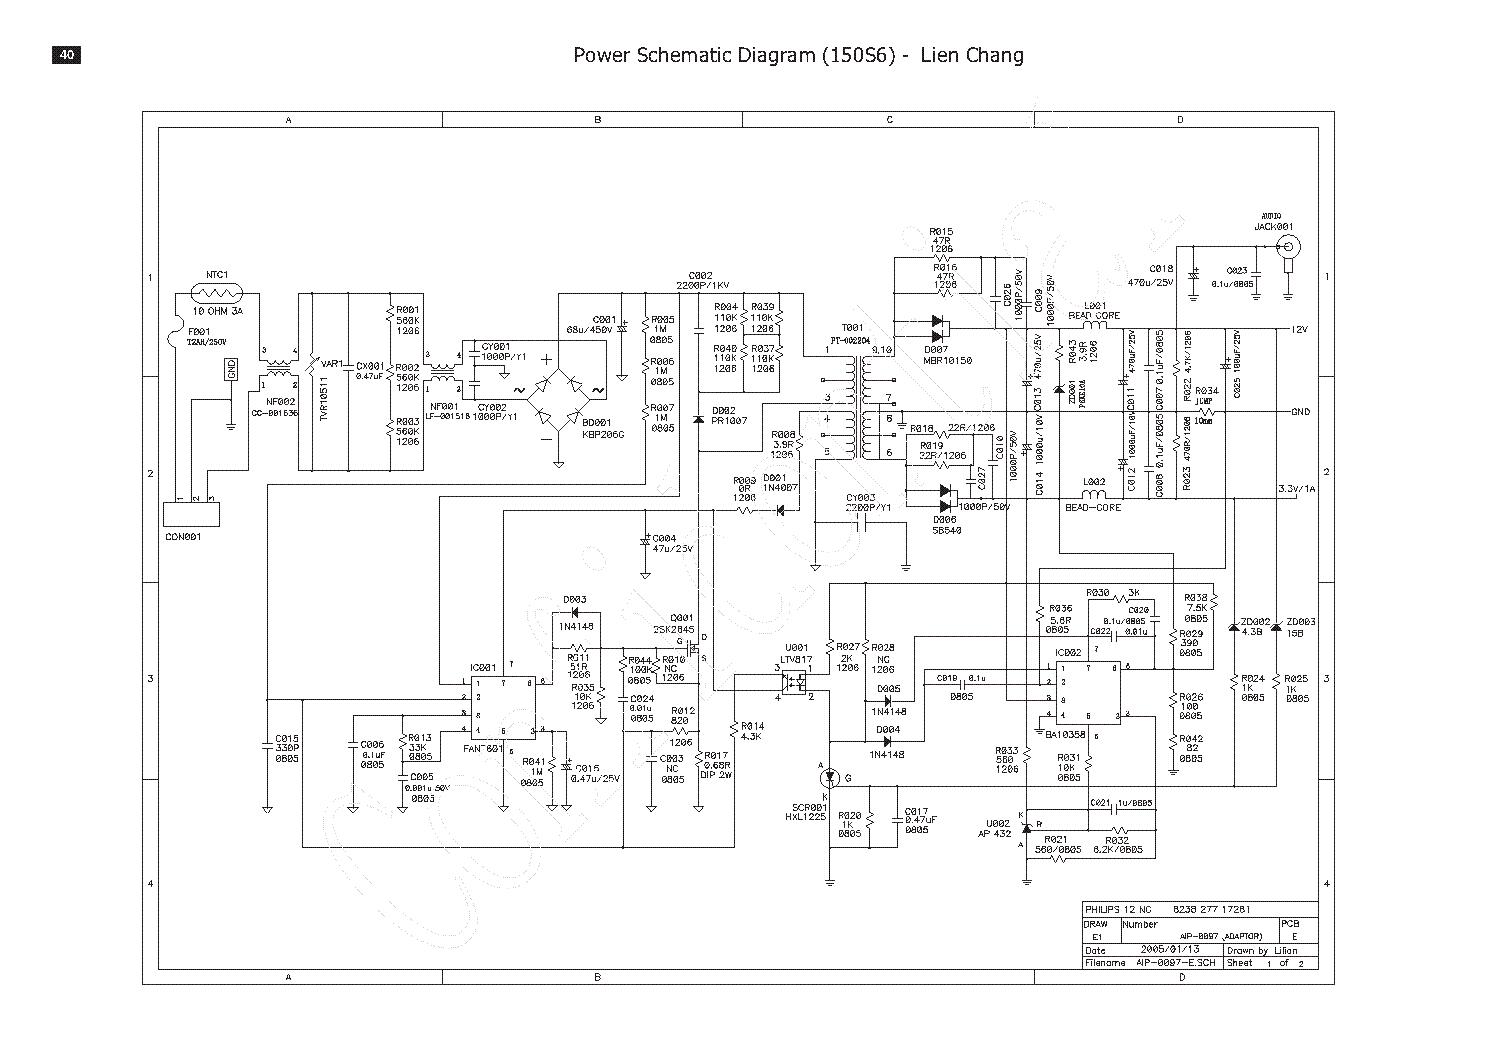 схема принципиальная блока питания монитора philips lien chang.co ai-0067